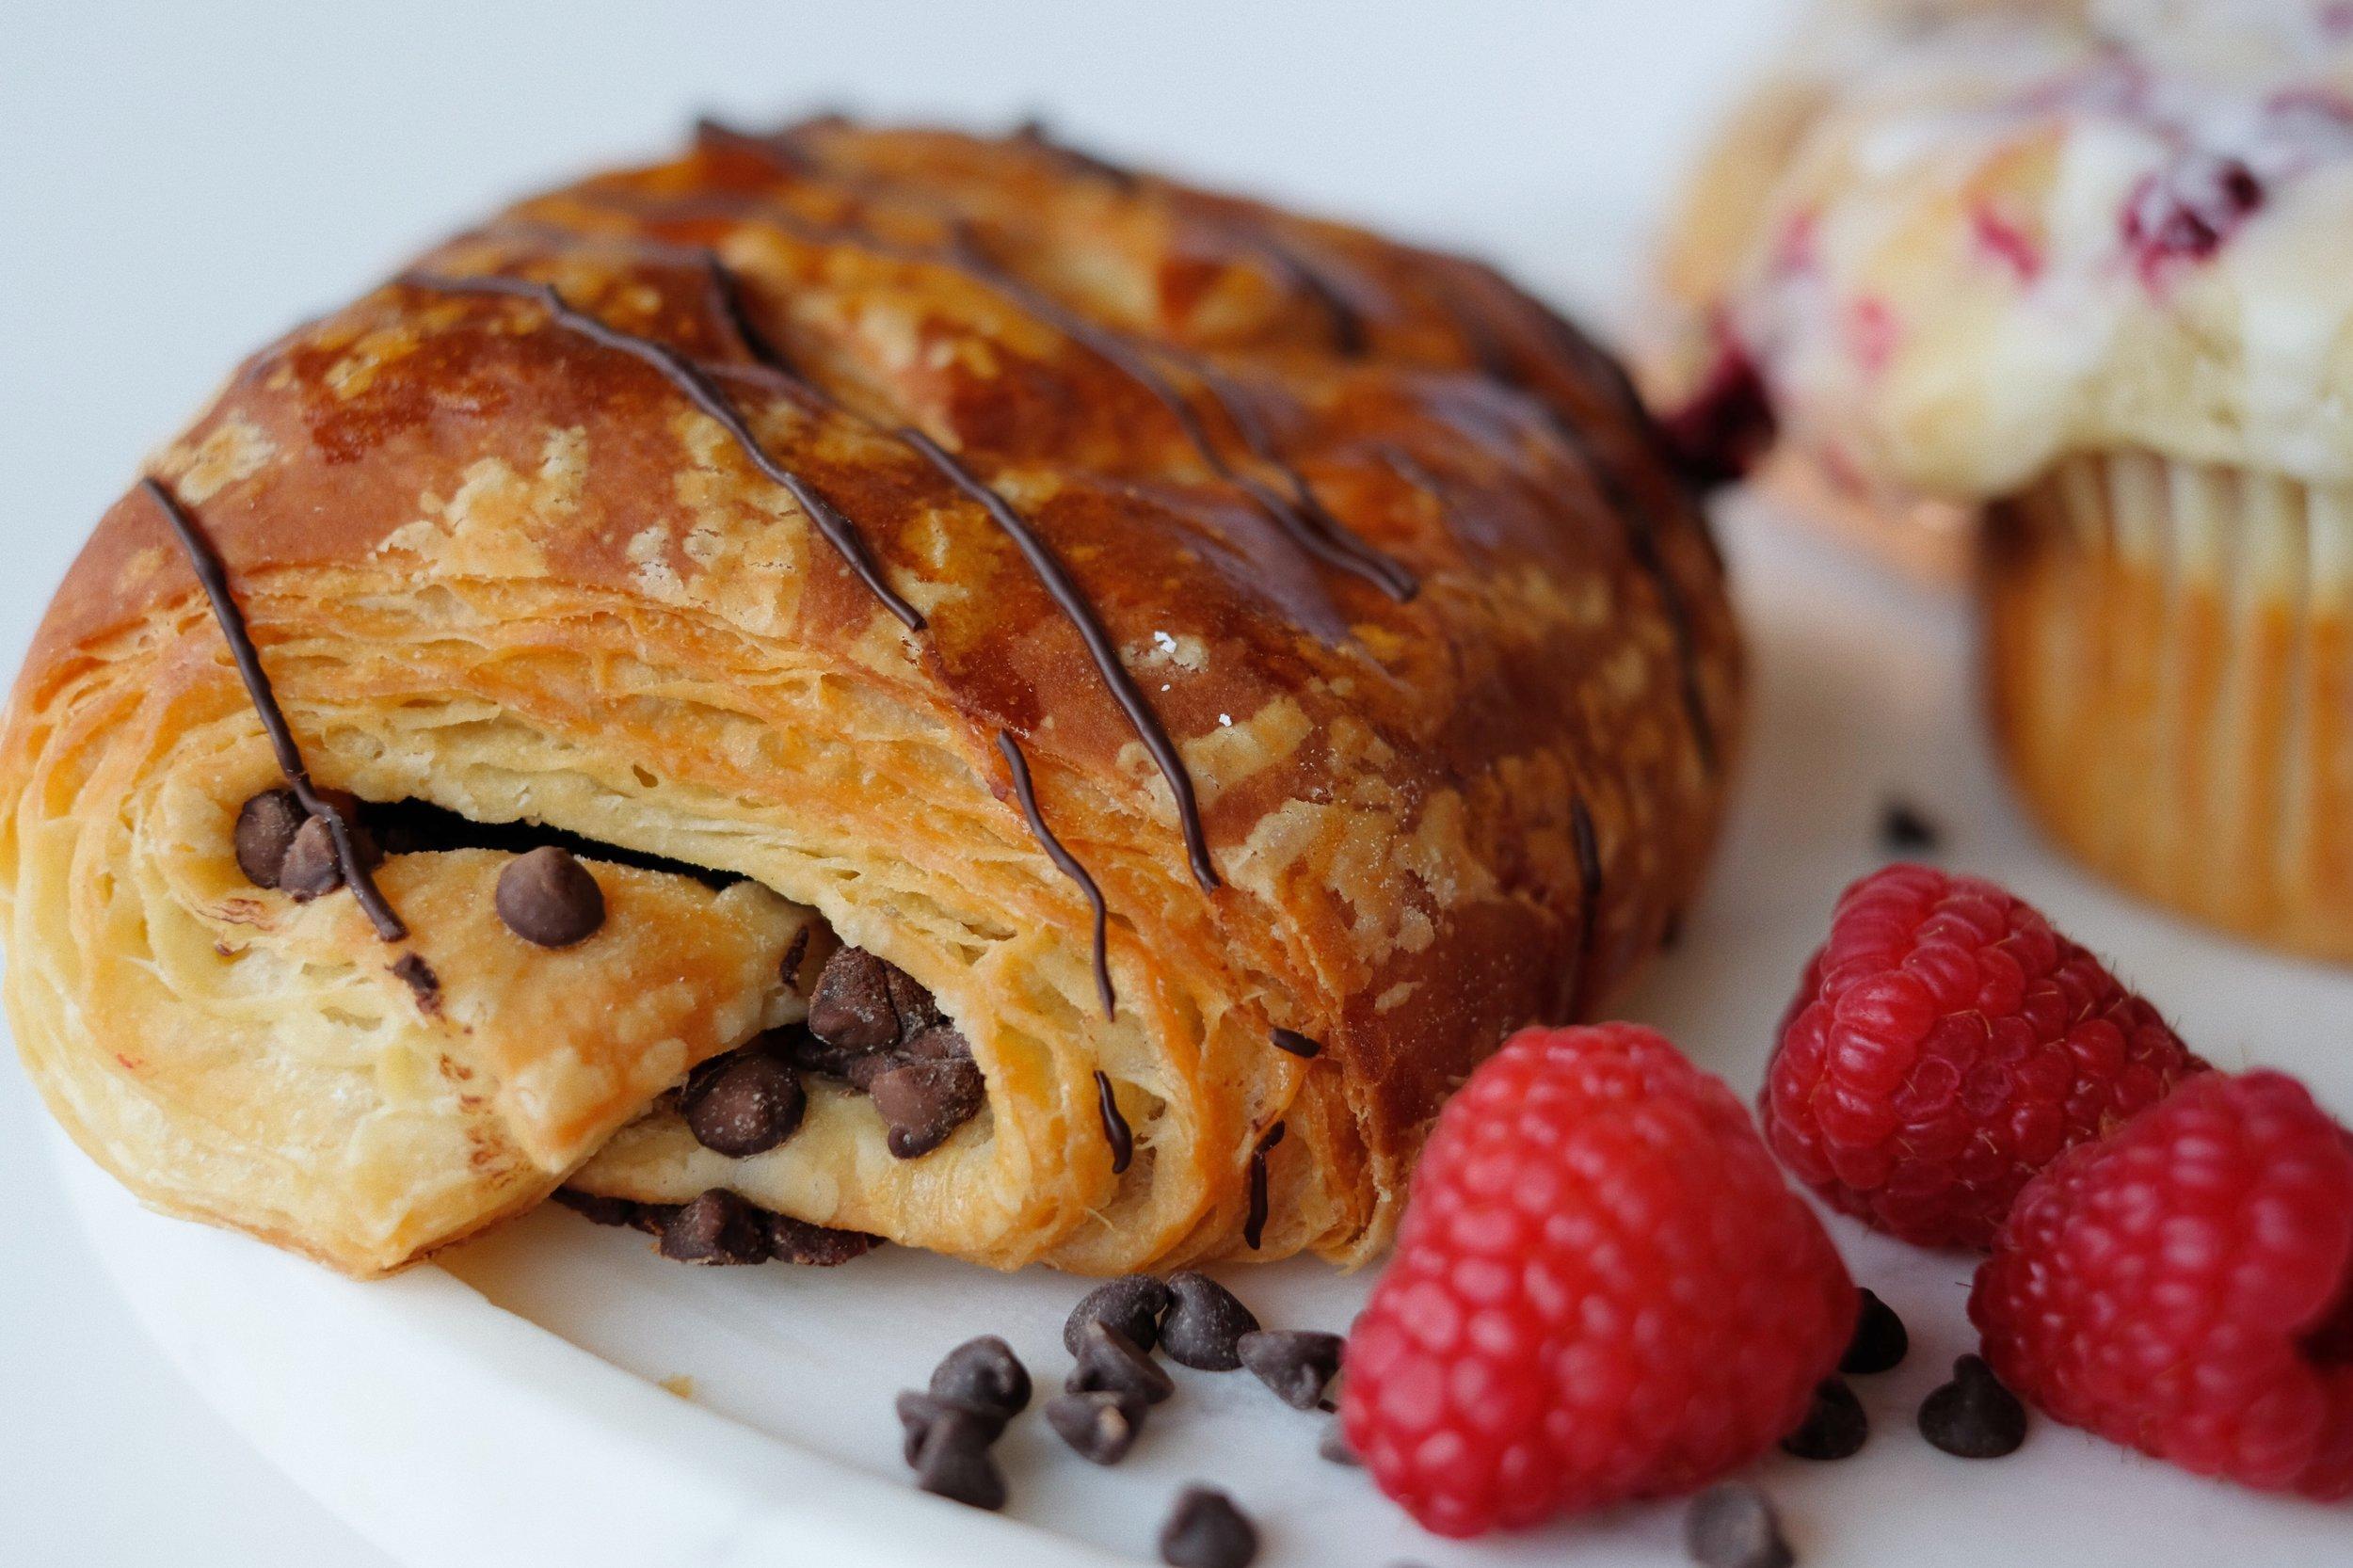 Jeff-Thatcher-Photography-Raspberry-Chocolate -Croissant.JPG